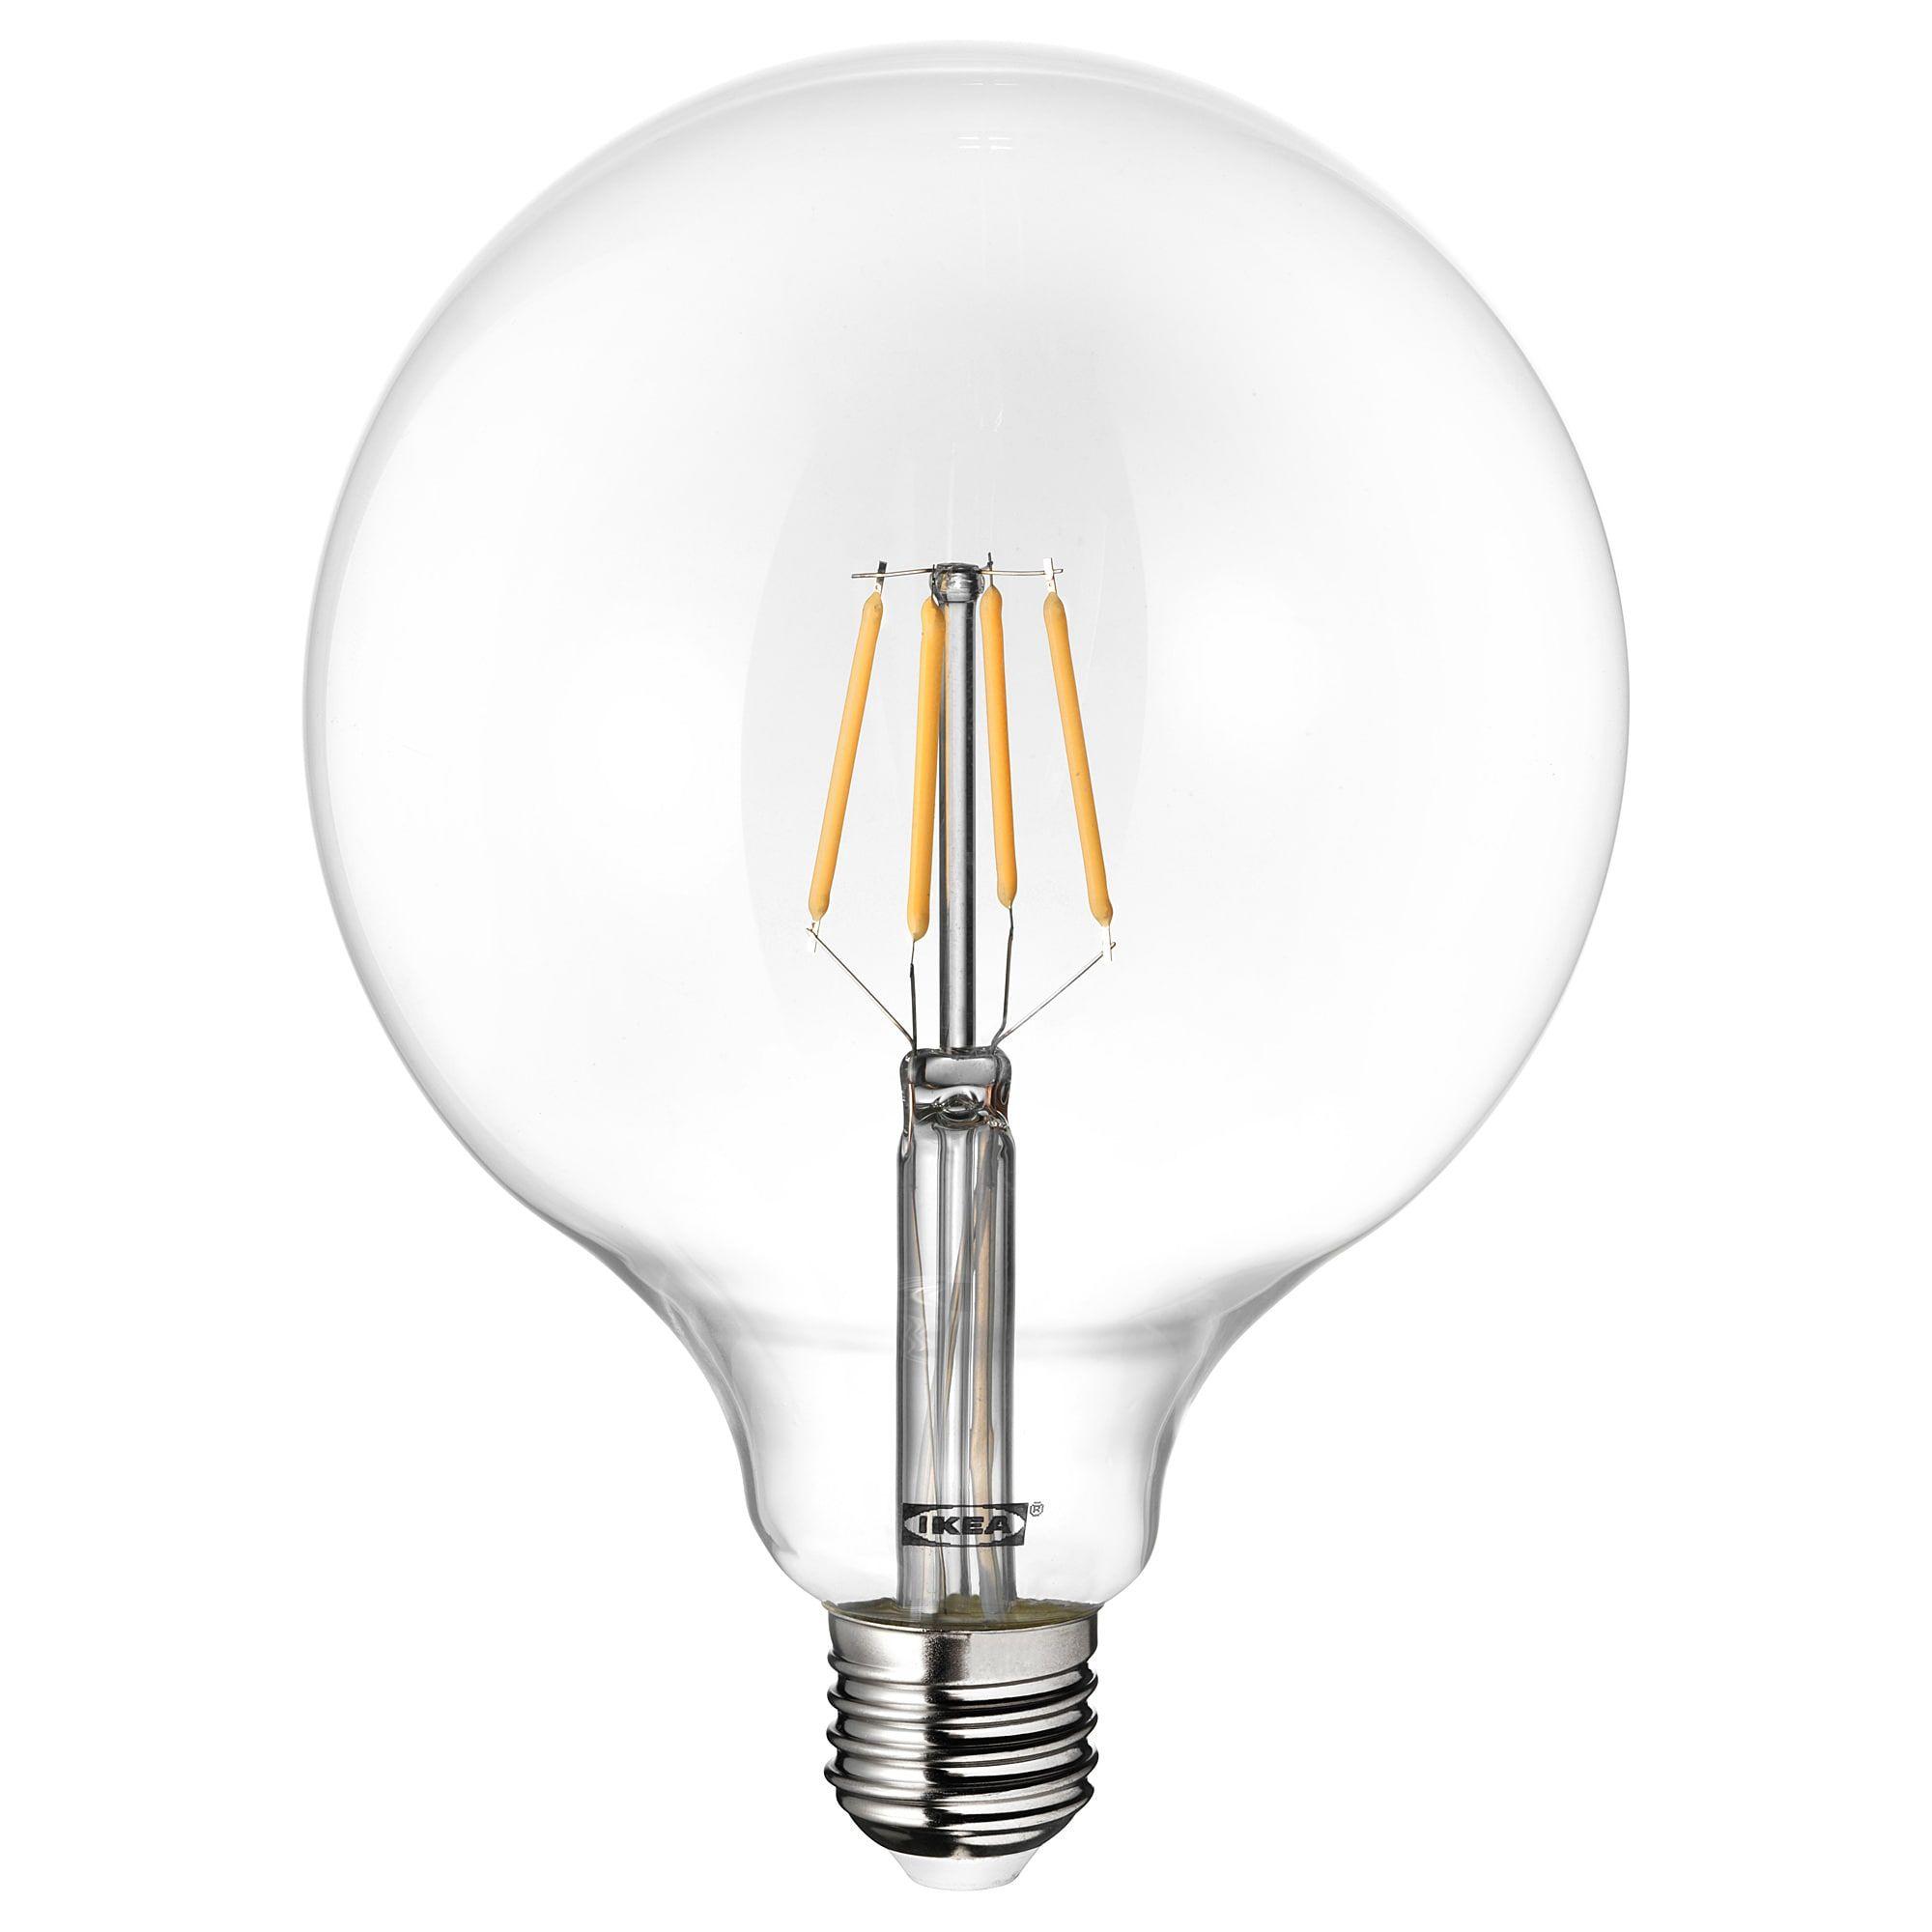 Image Result For Large Industrial Light Bulb Ikea Led Leuchtmittel Leuchtmittel E27 Leuchtmittel